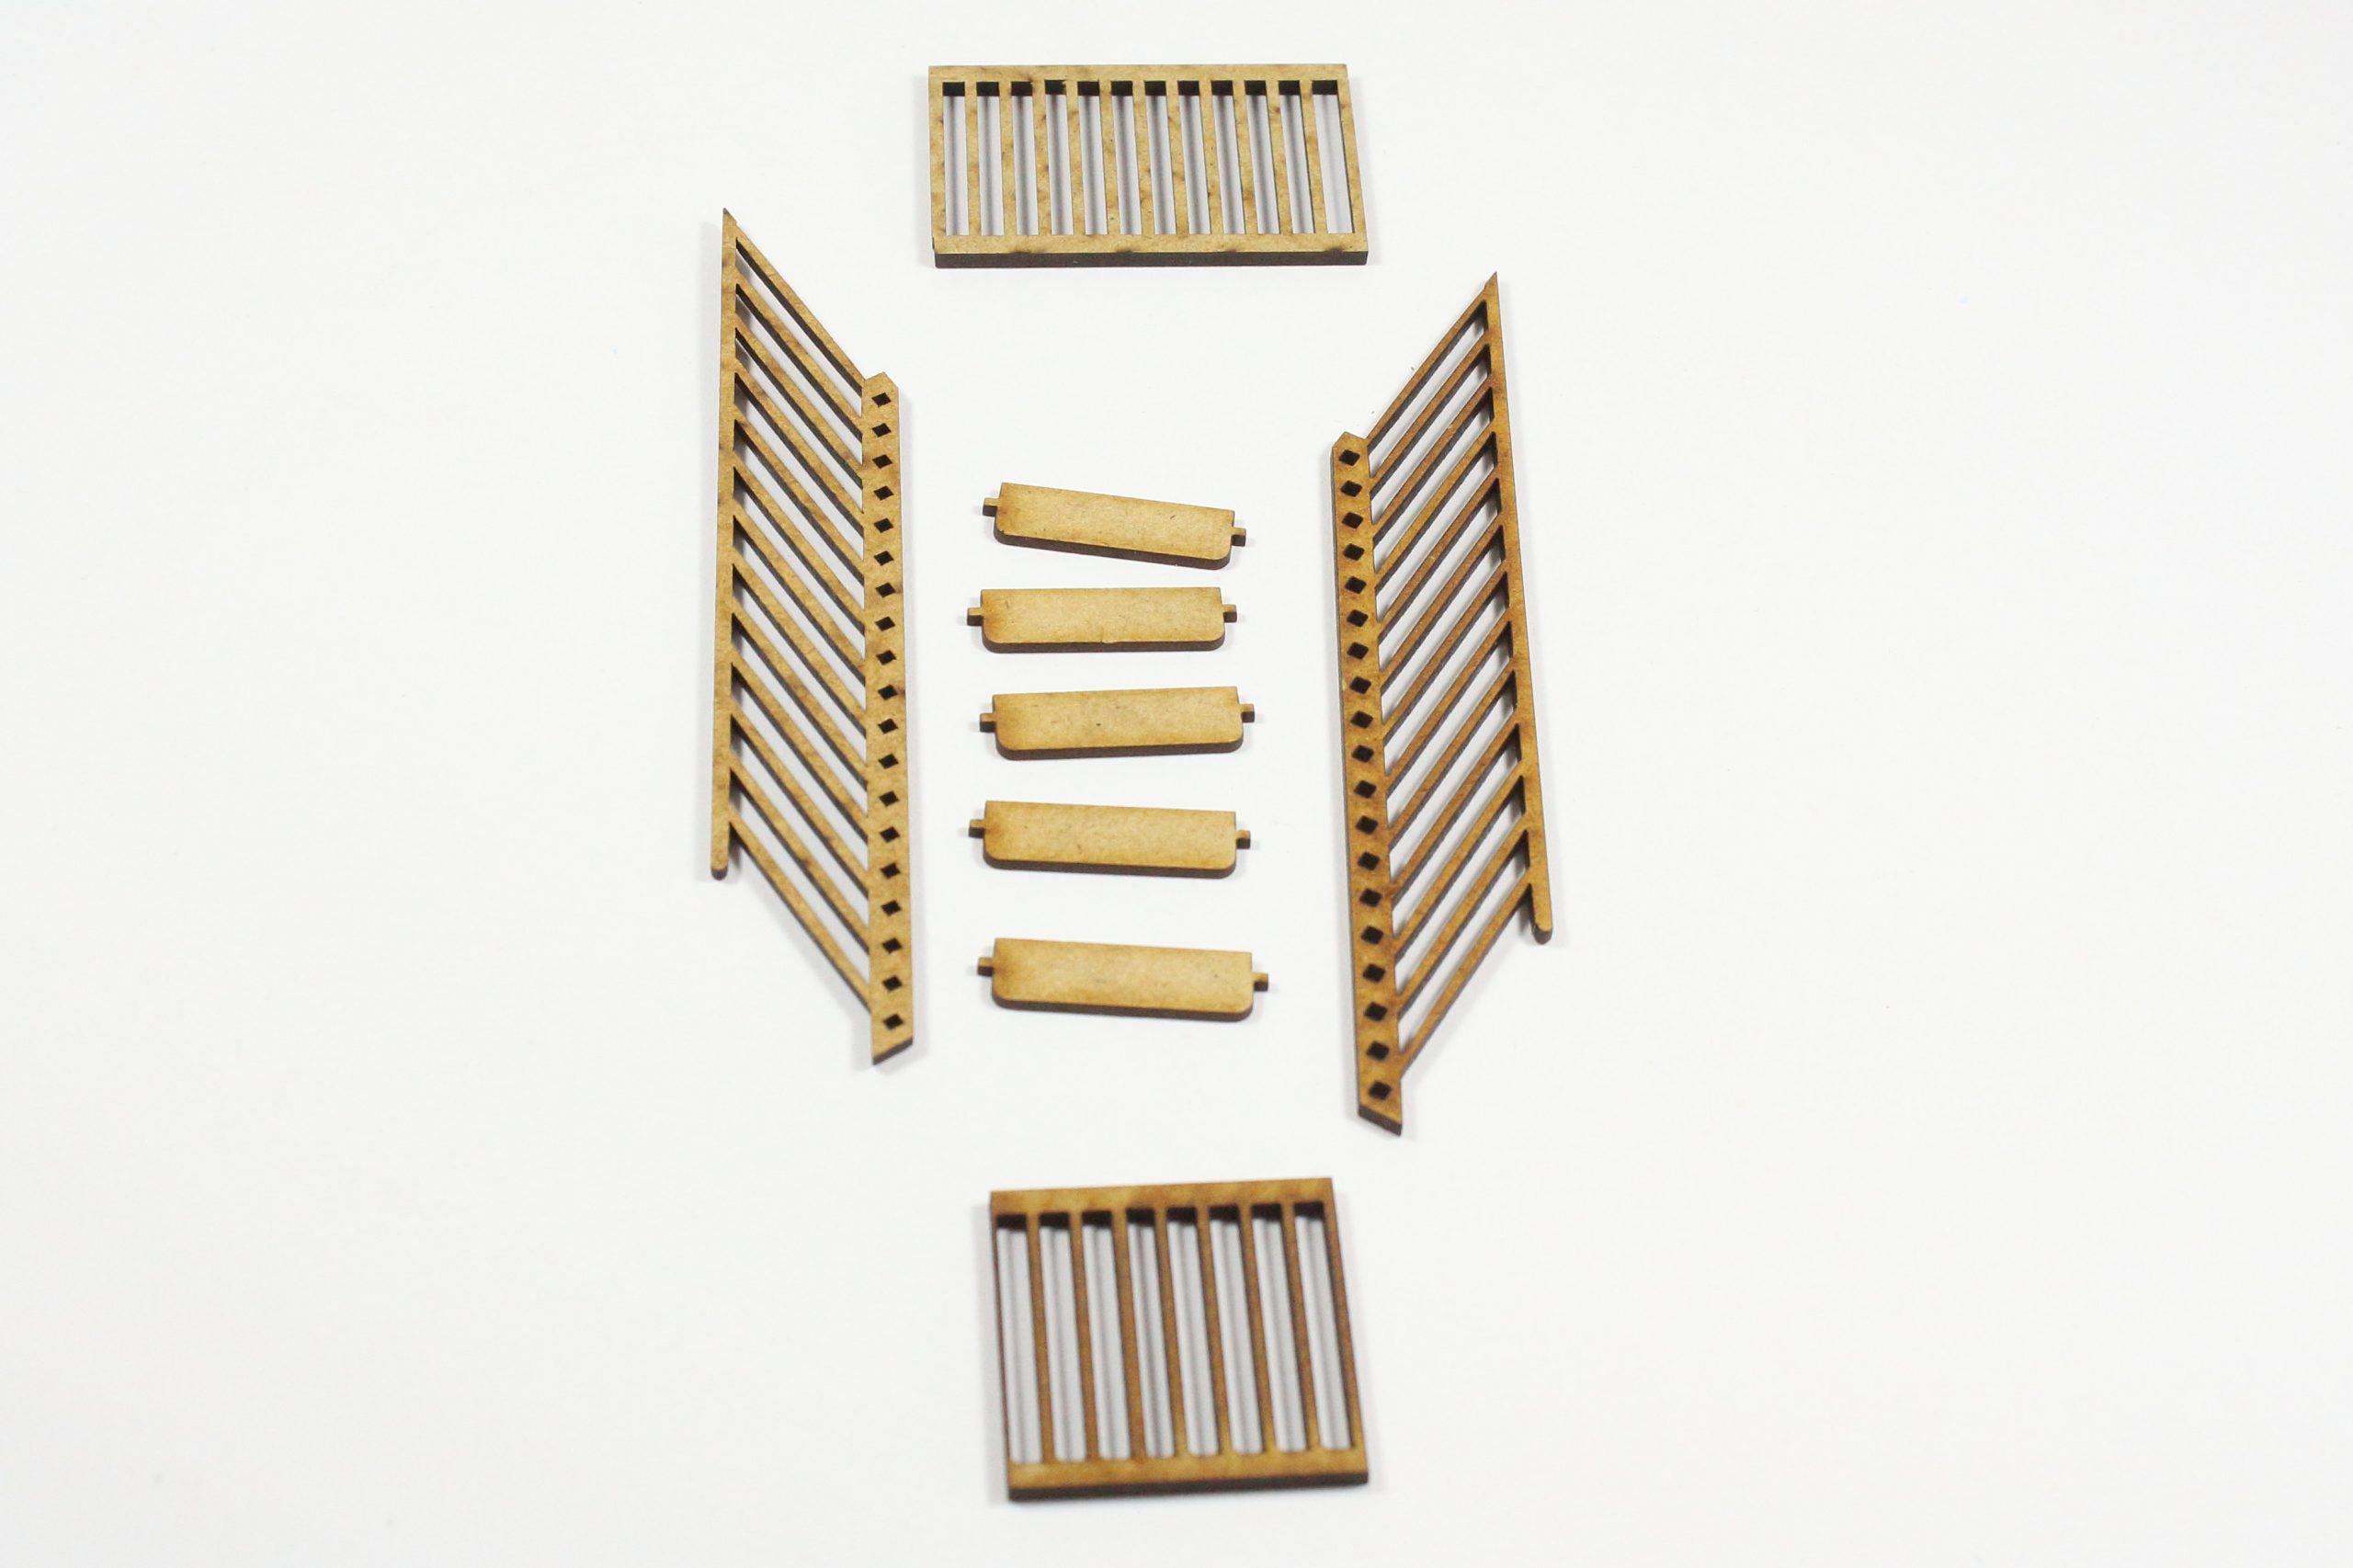 Bild-6-scaled Fachwerkhaus mit Holzschuppen - Lasercut Modellbaushop 1:35